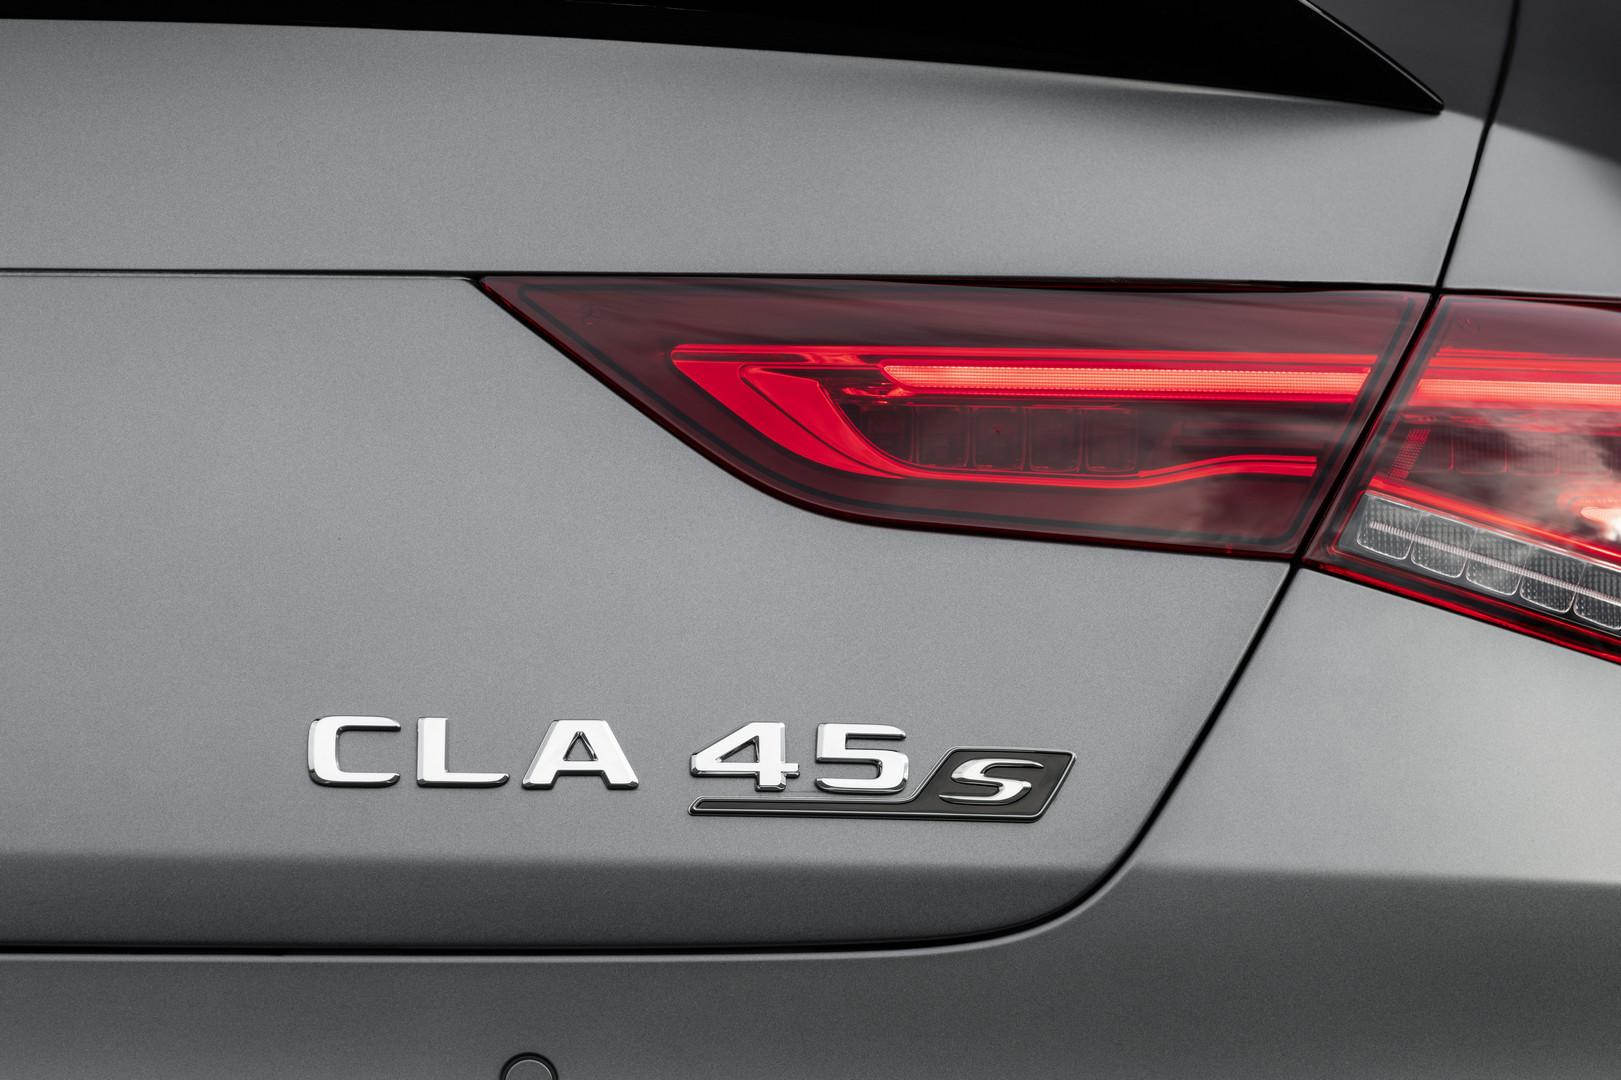 CLA 45 S AMG Badge